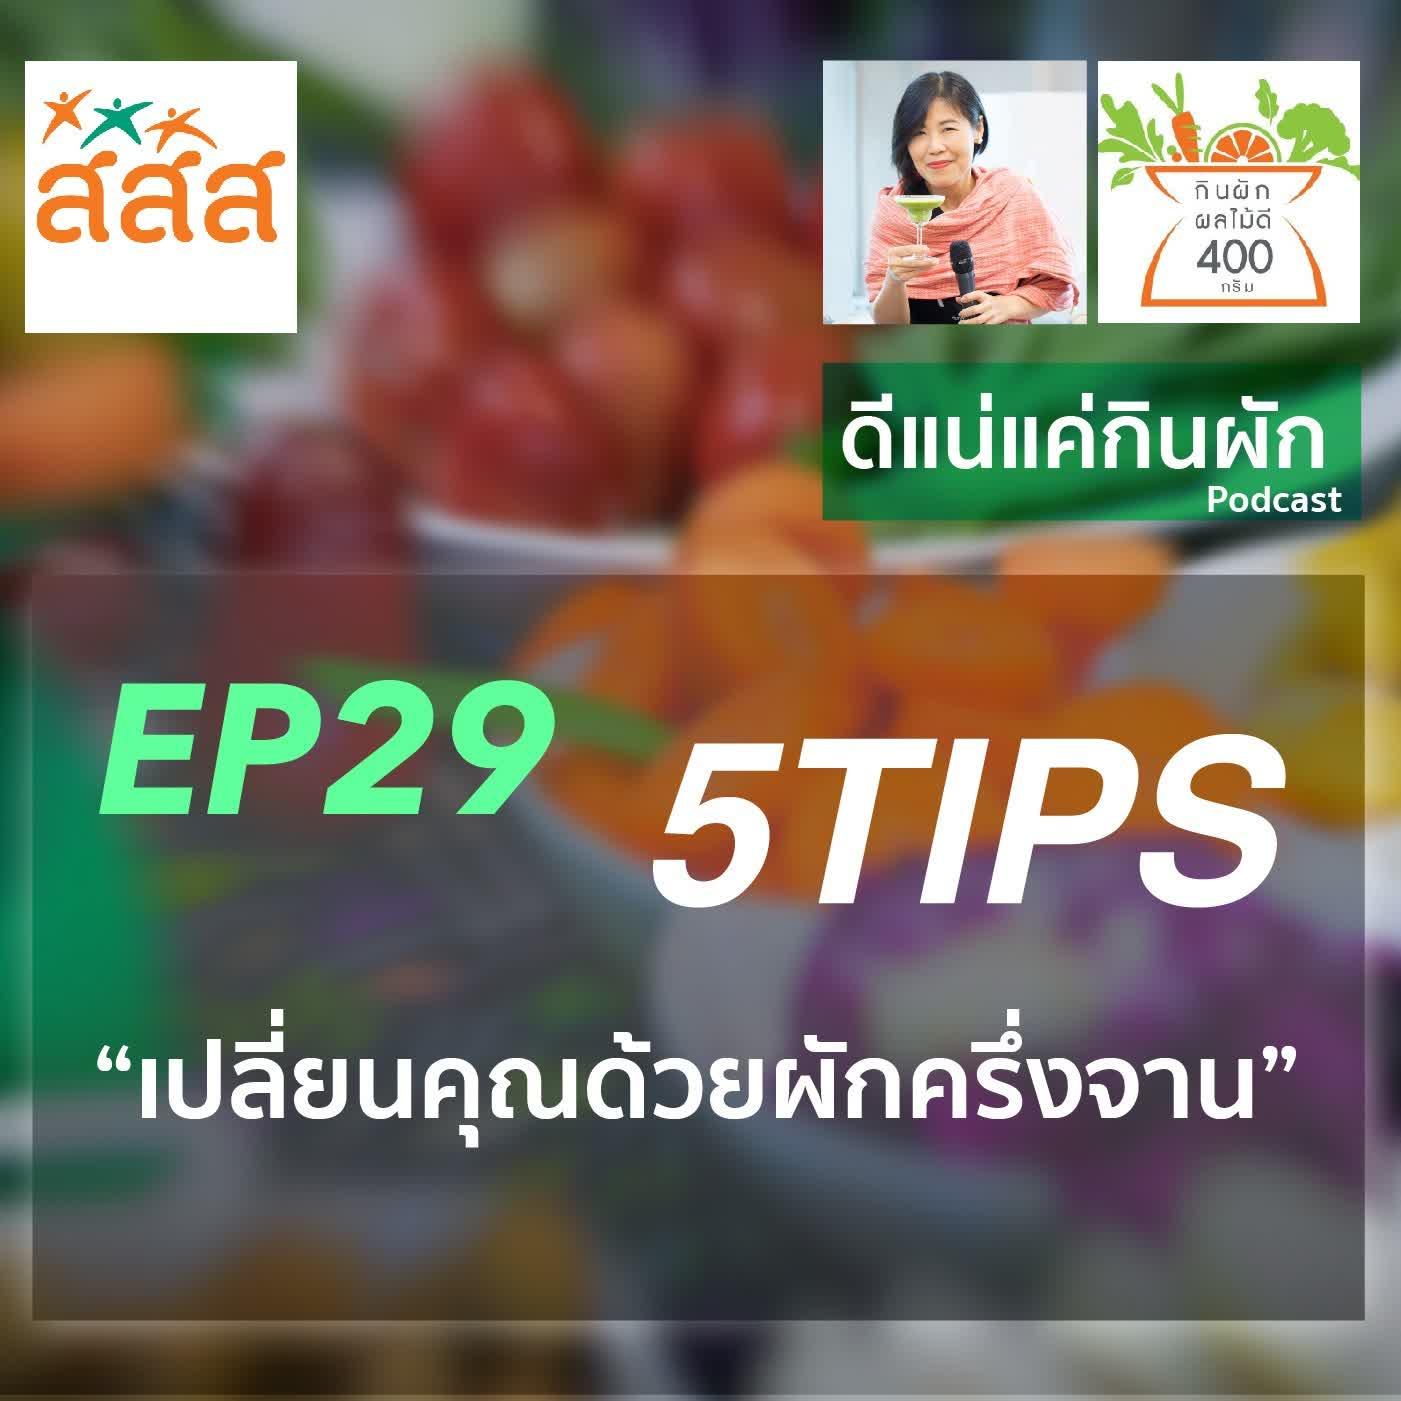 EP029 : 5 tips เปลี่ยนคุณด้วยผักครึ่งจาน